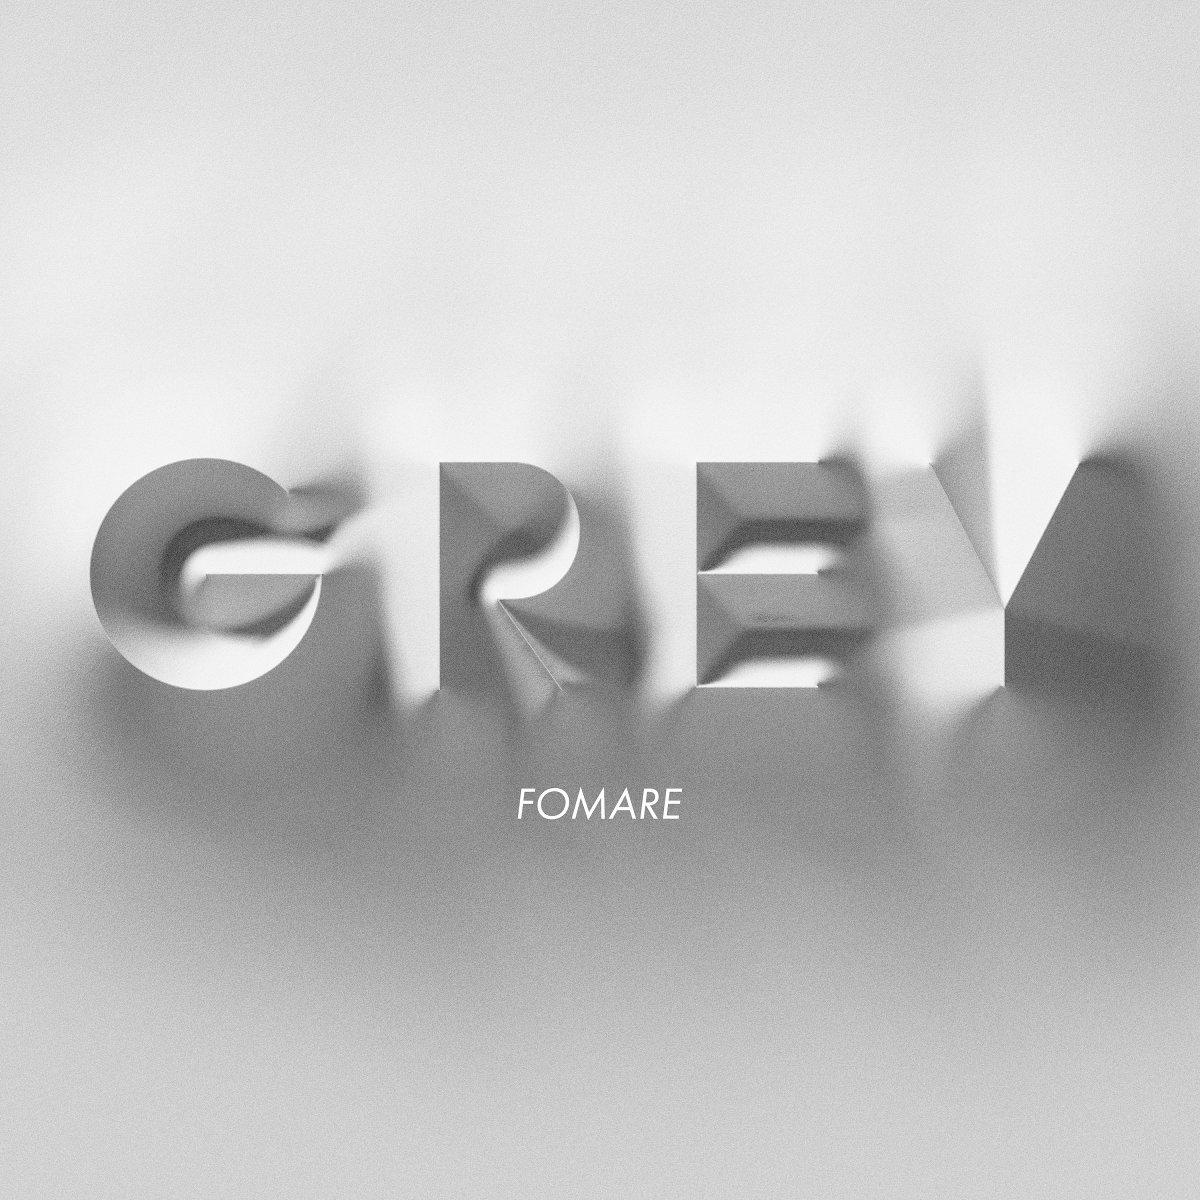 『FOMARE - Grey 歌詞』収録の『Grey』ジャケット